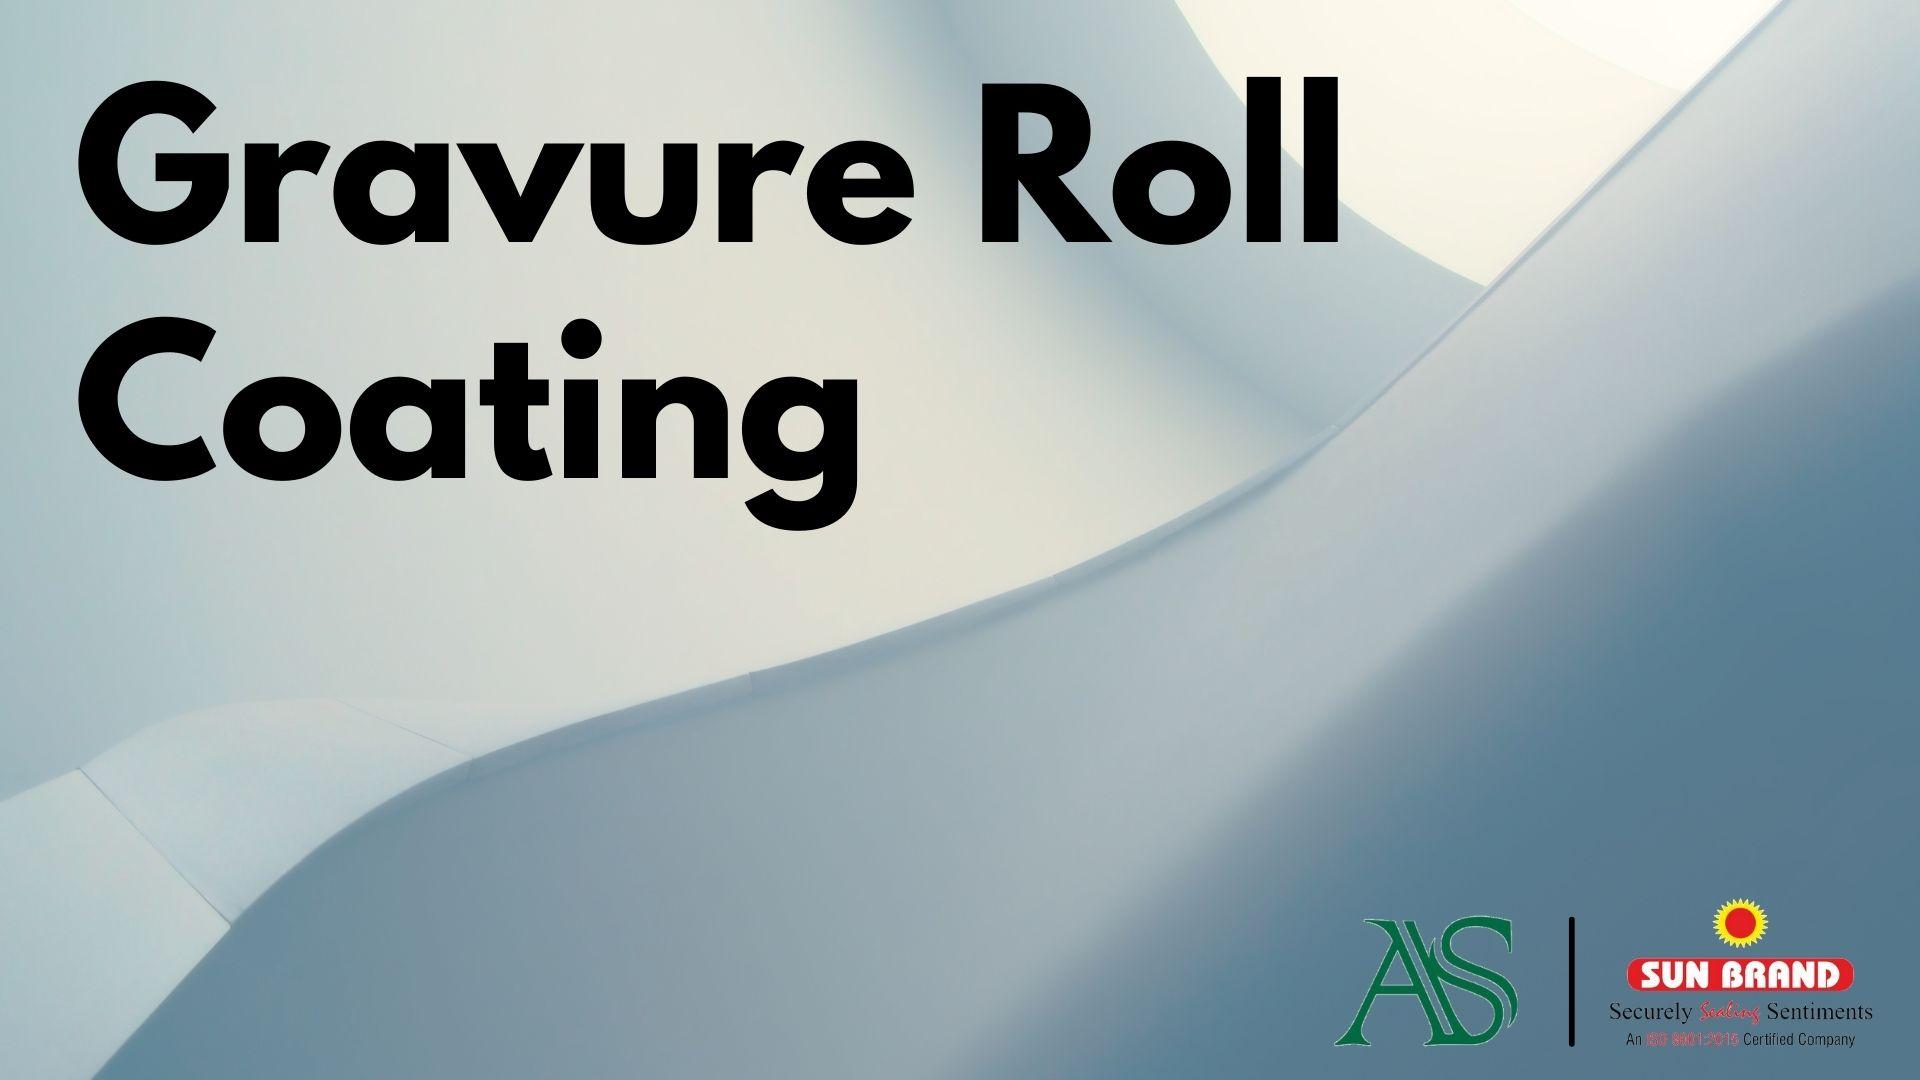 Gravure Roll Coating